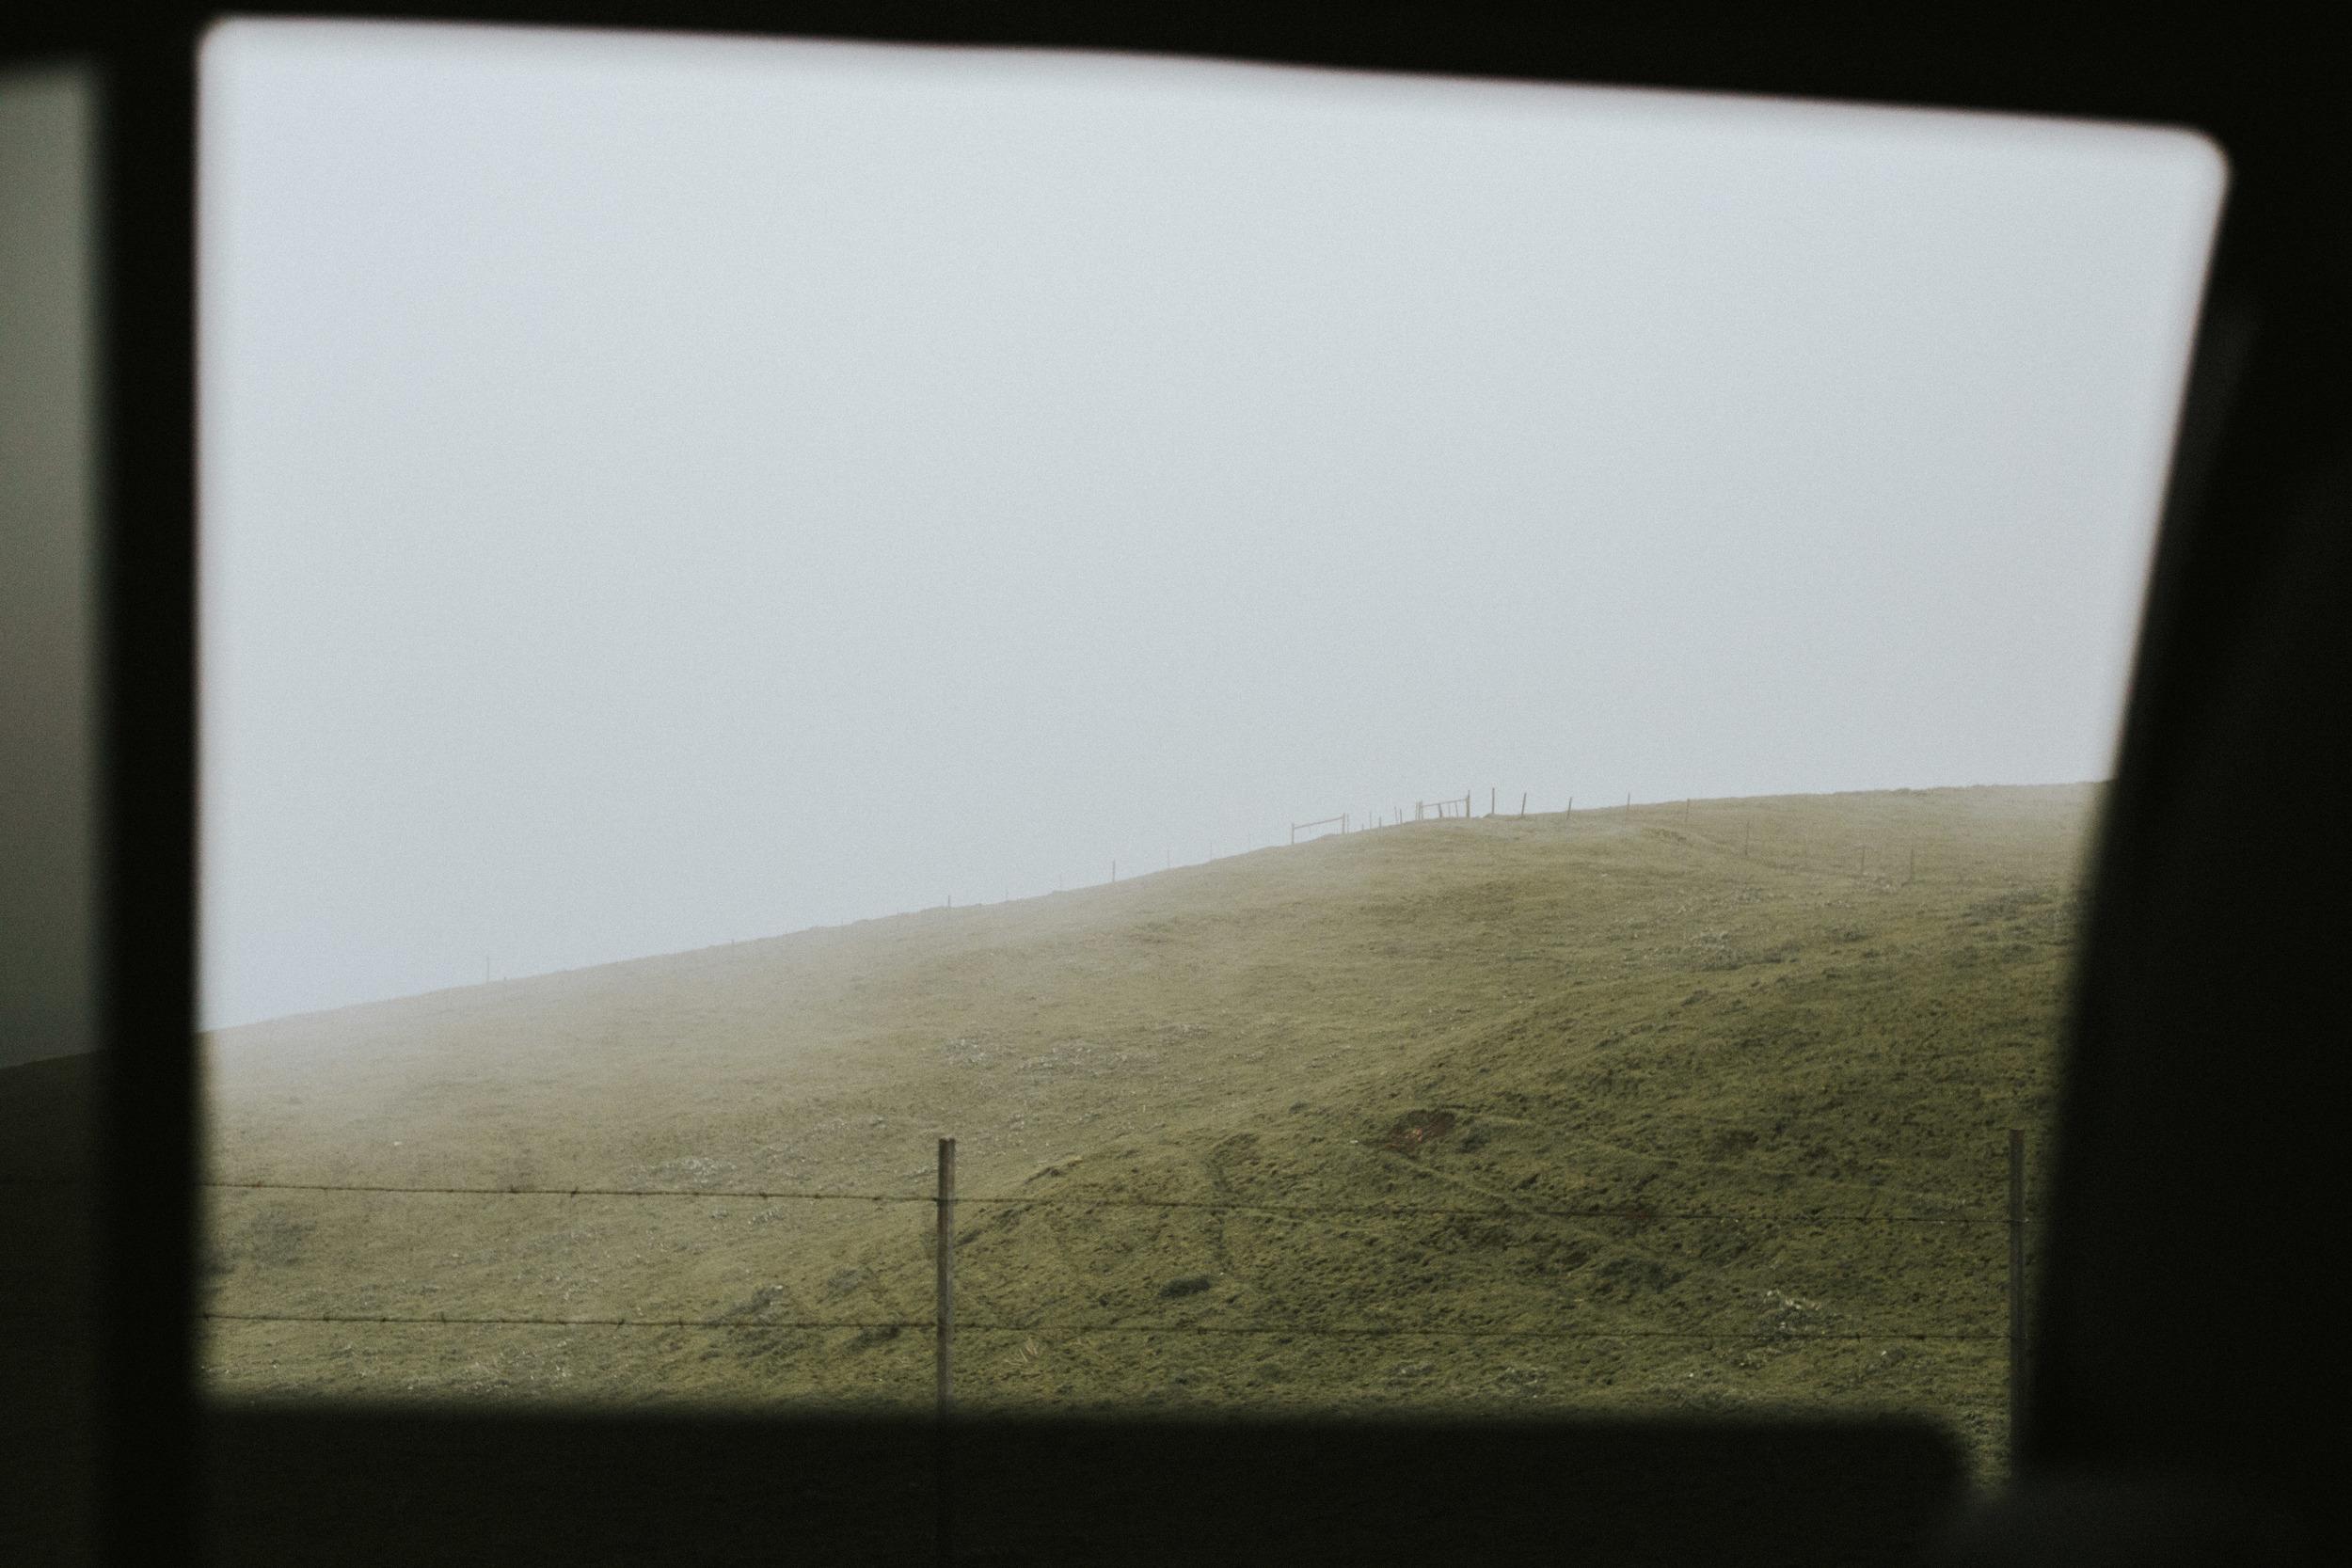 pointreyes-fog-5.jpg